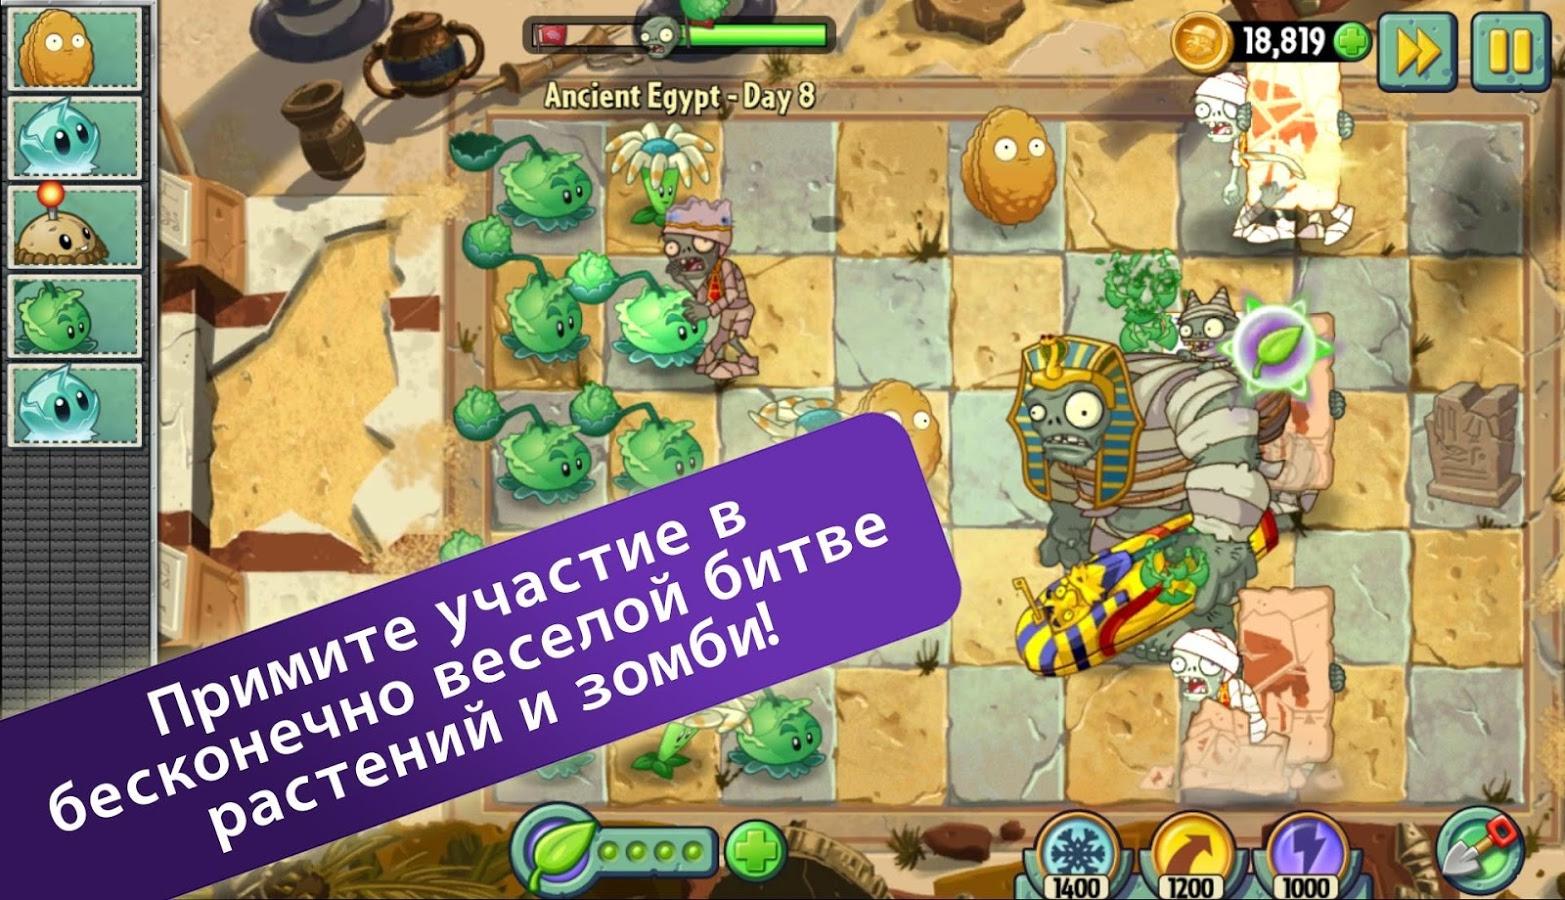 Скачать plants vs zombies 2 7. 0. 1 для android.